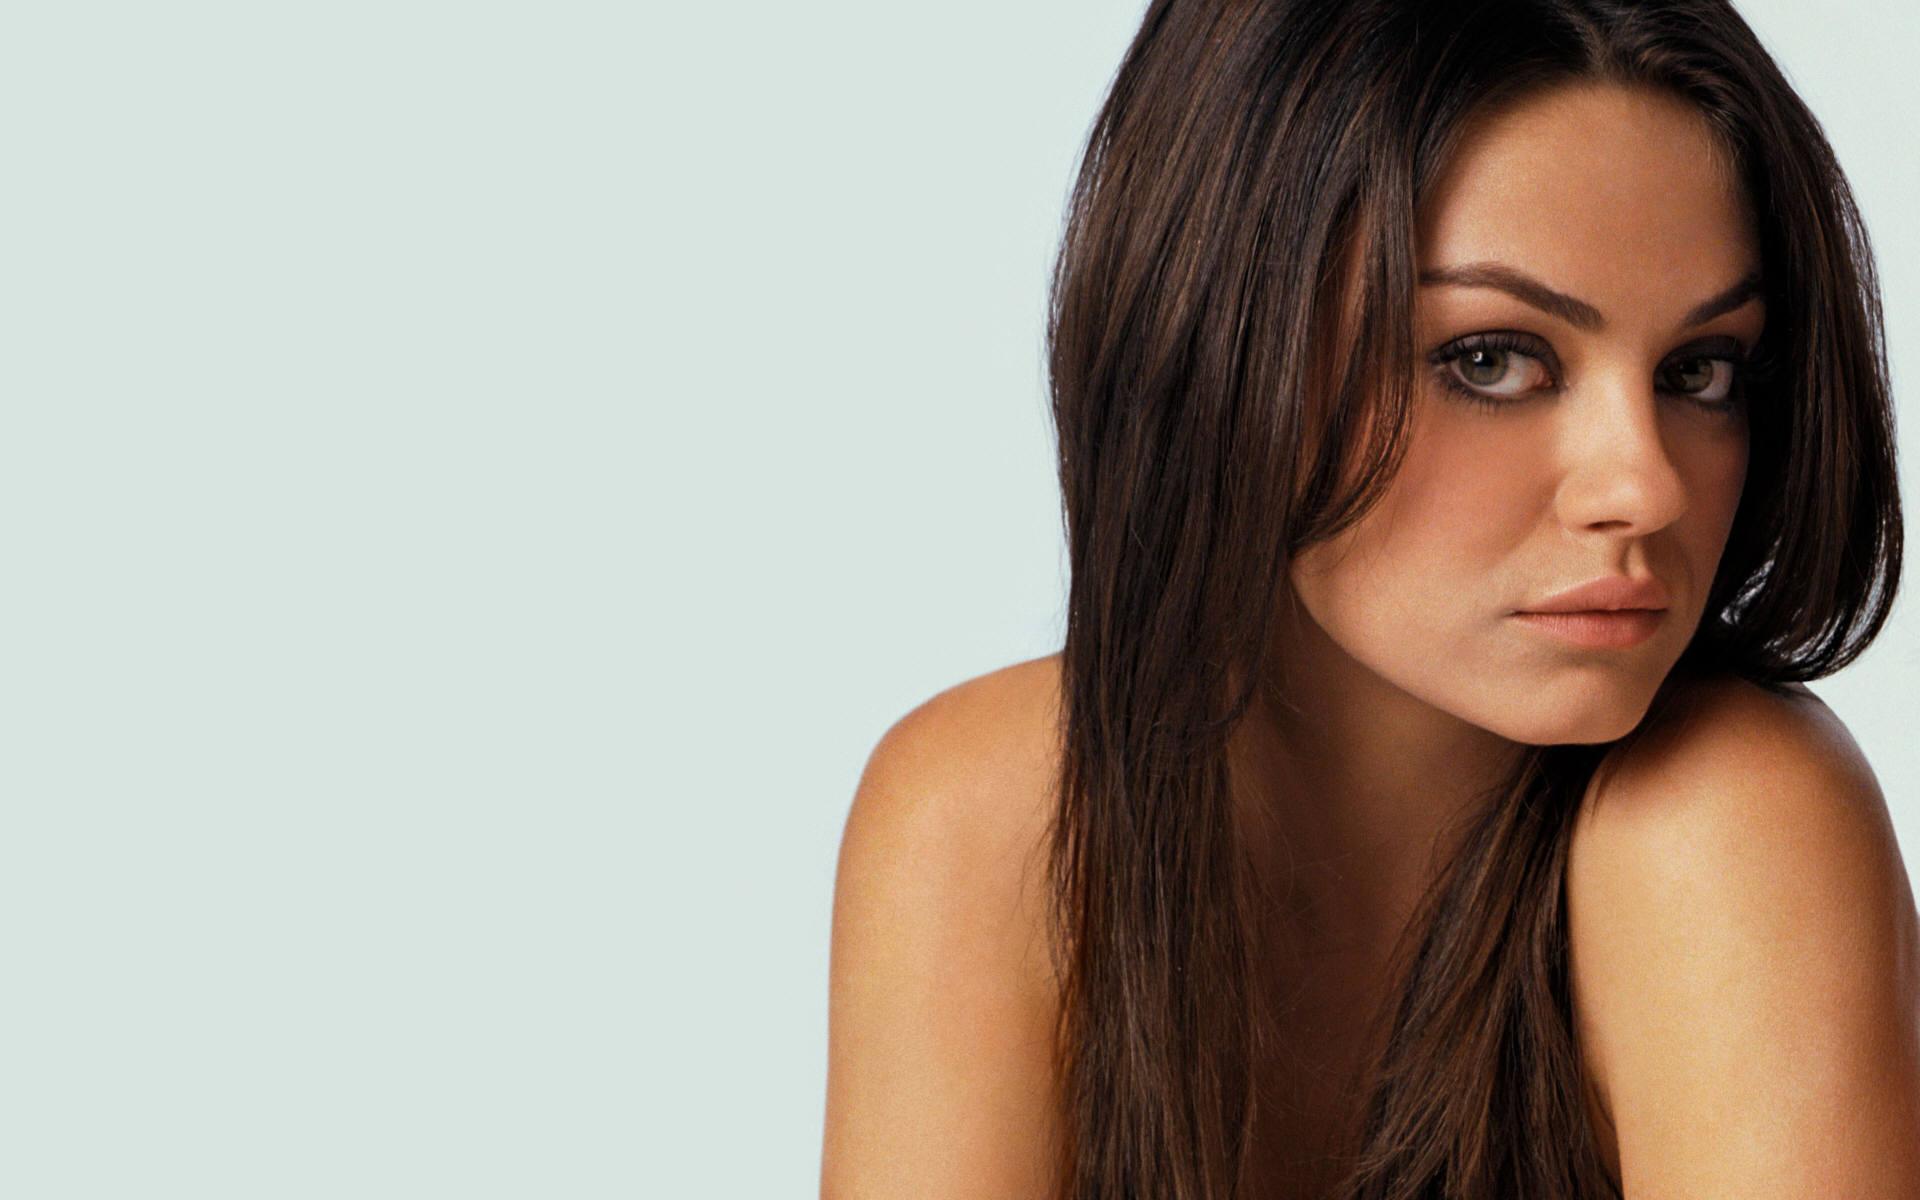 Mila Kunis Wallpaper